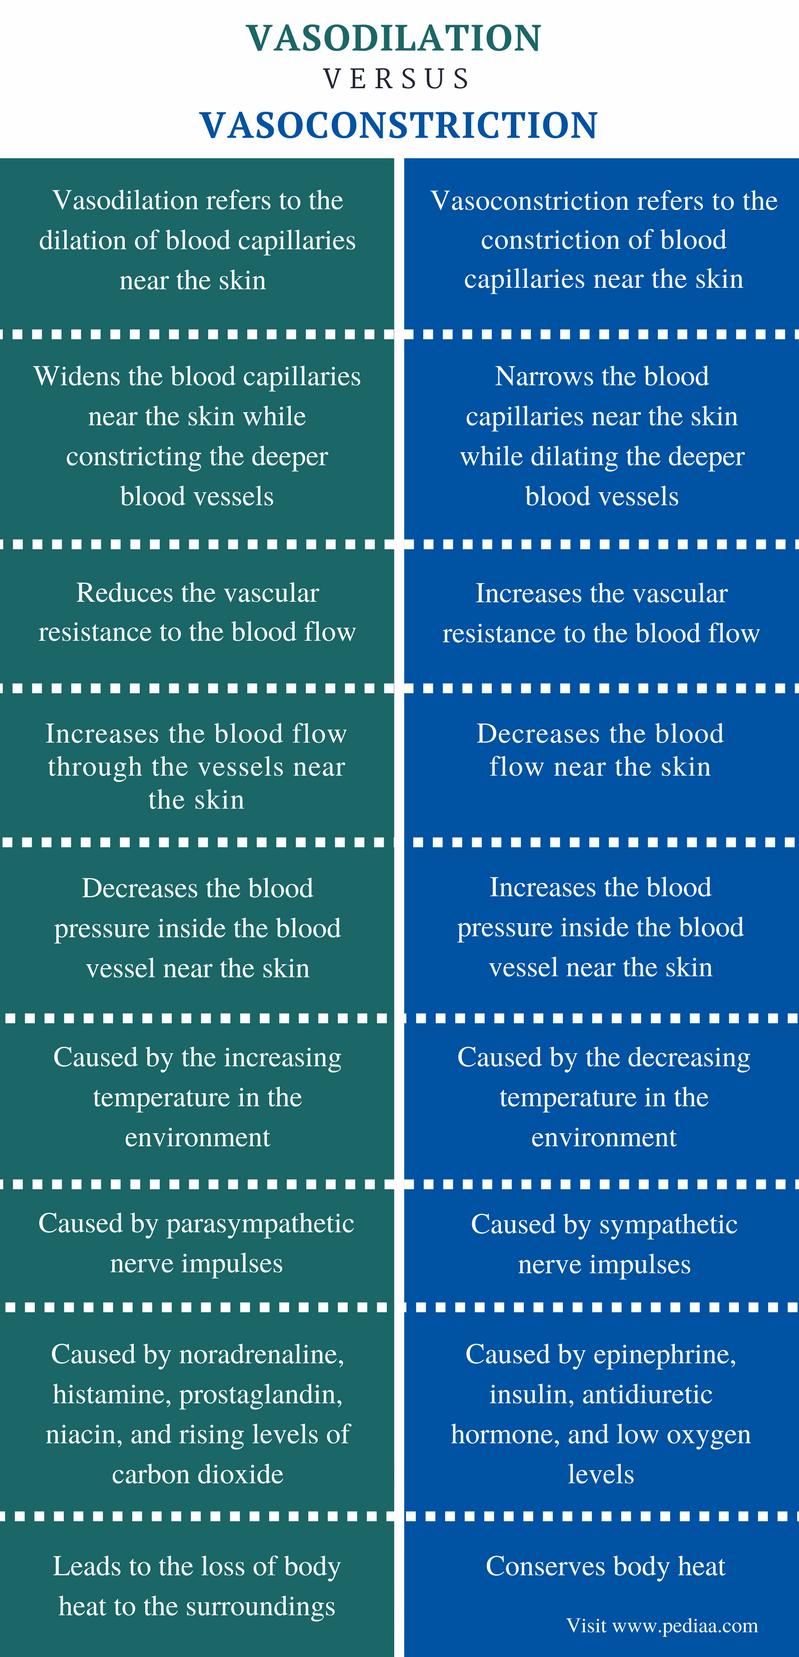 Difference Between Vasodilation and Vasoconstriction - Comparison Summary